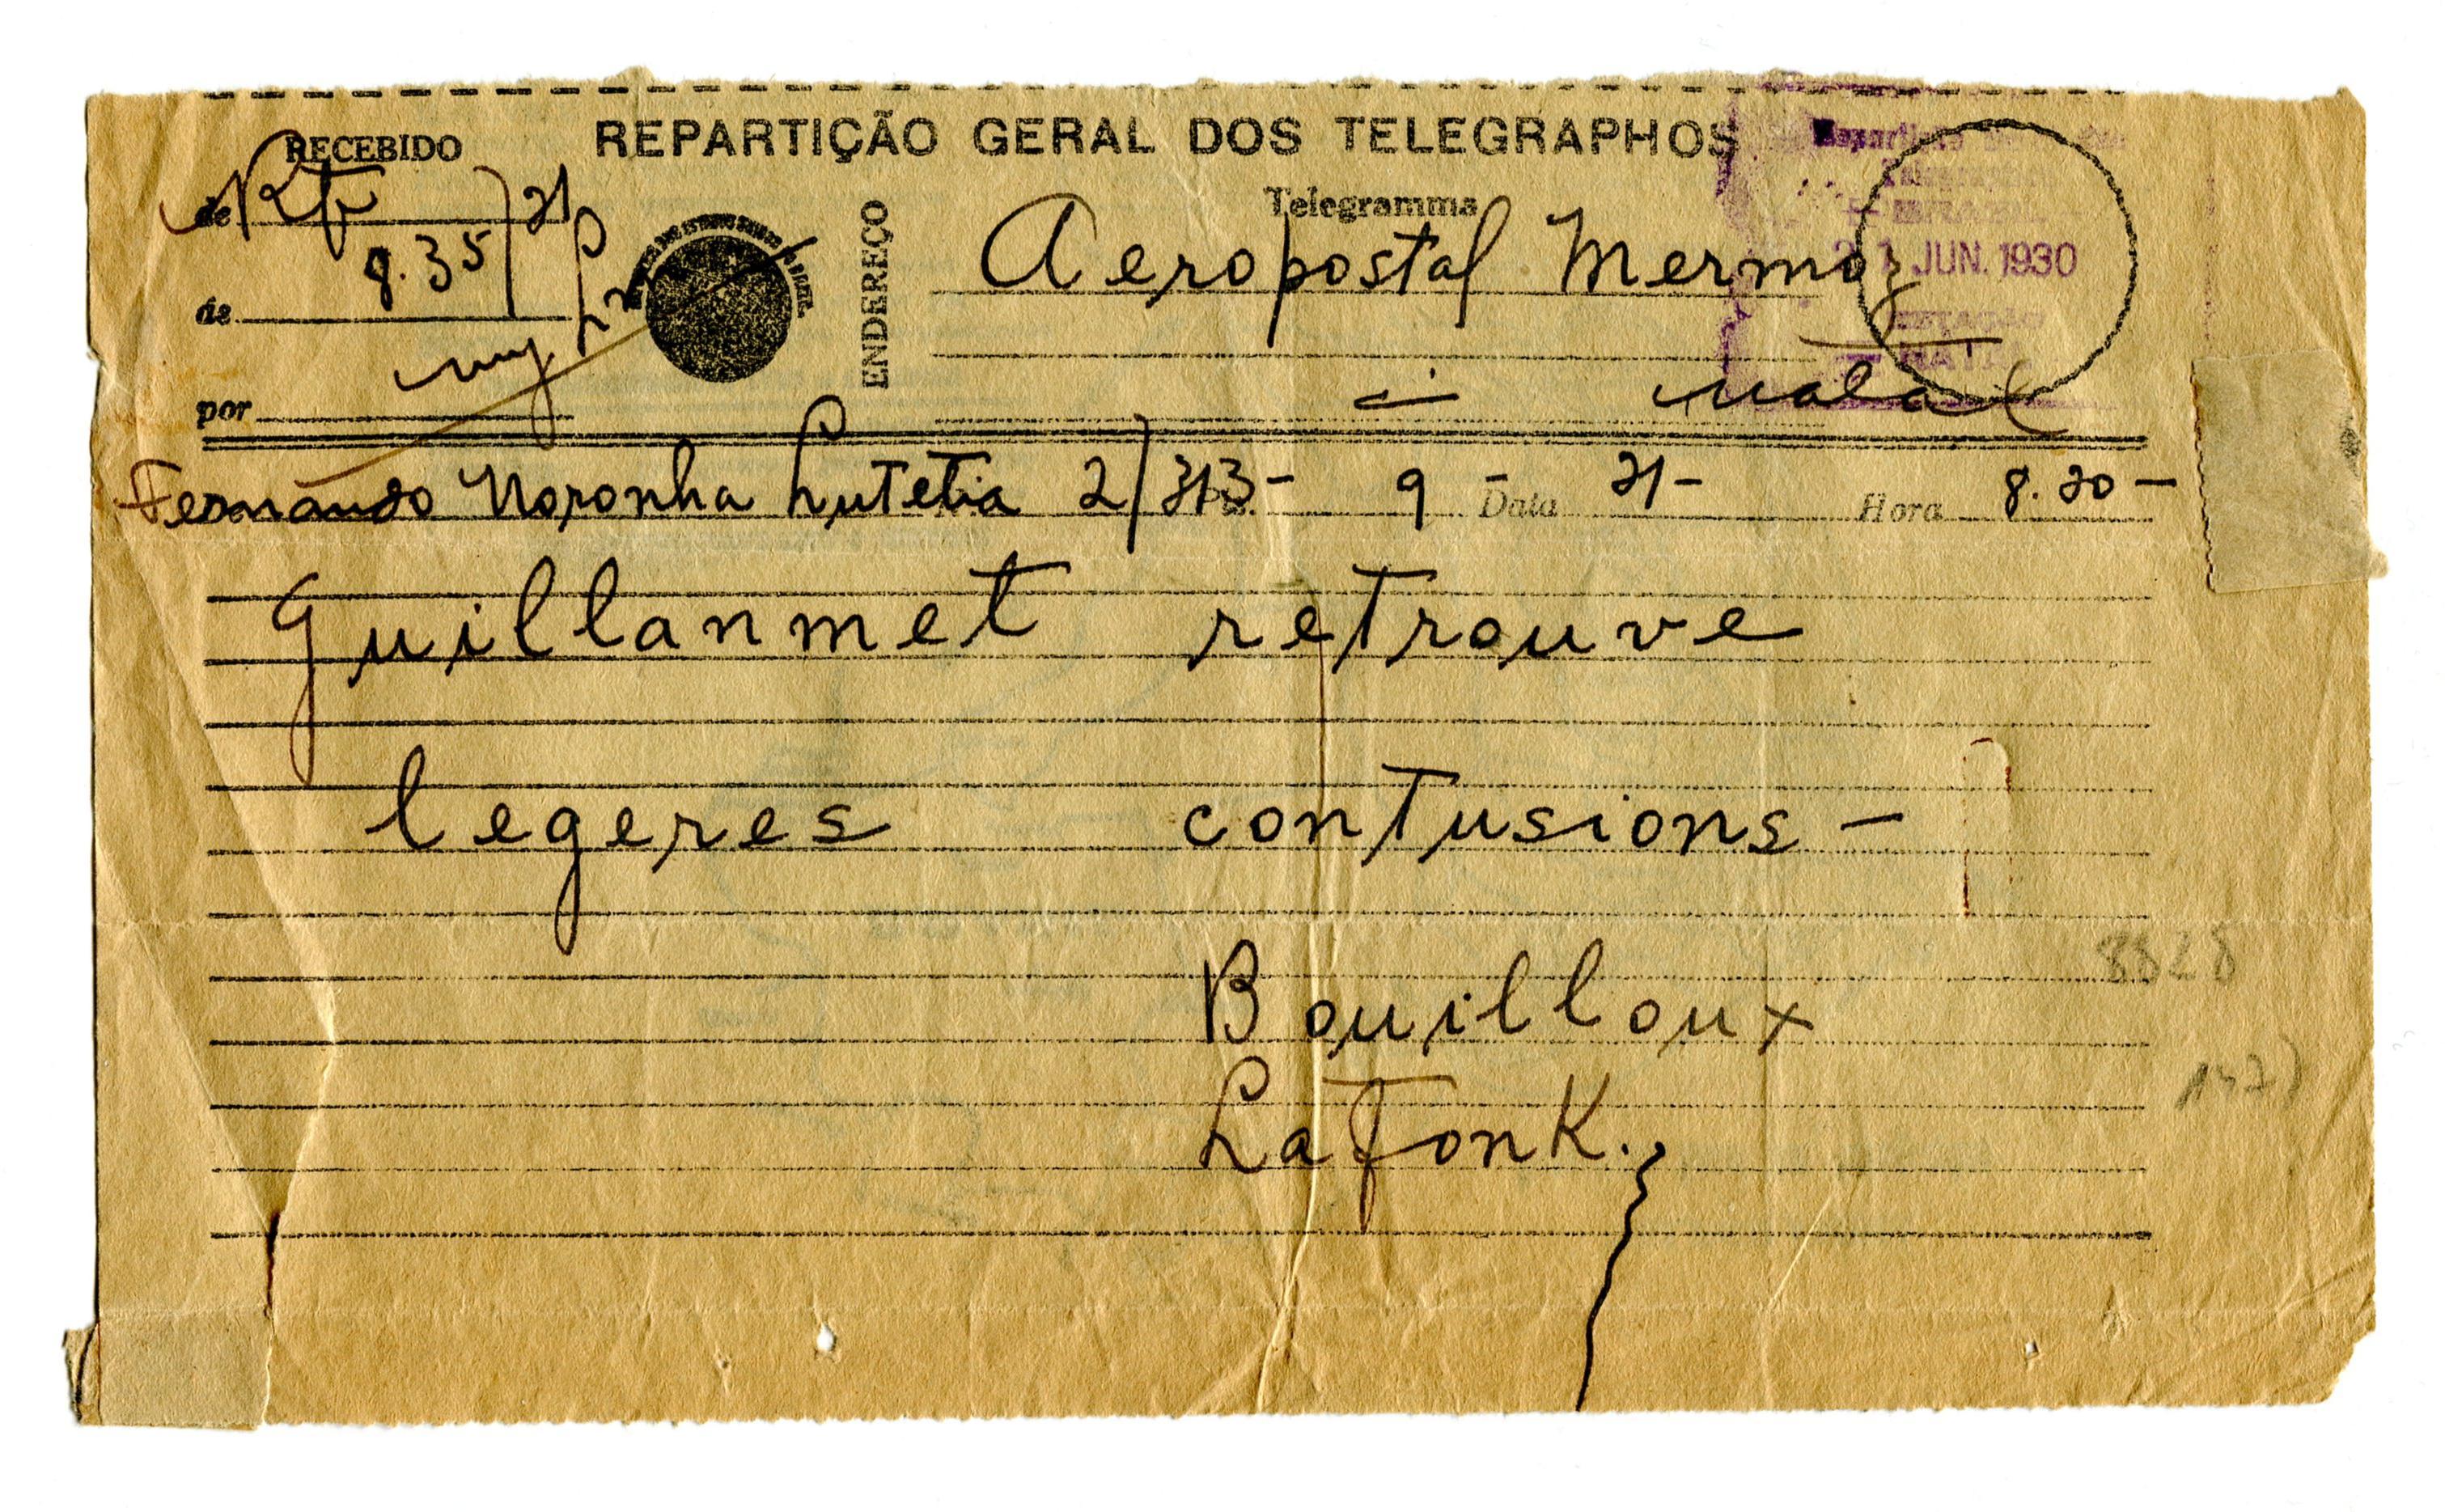 1930-06-21_telegramme.jpg